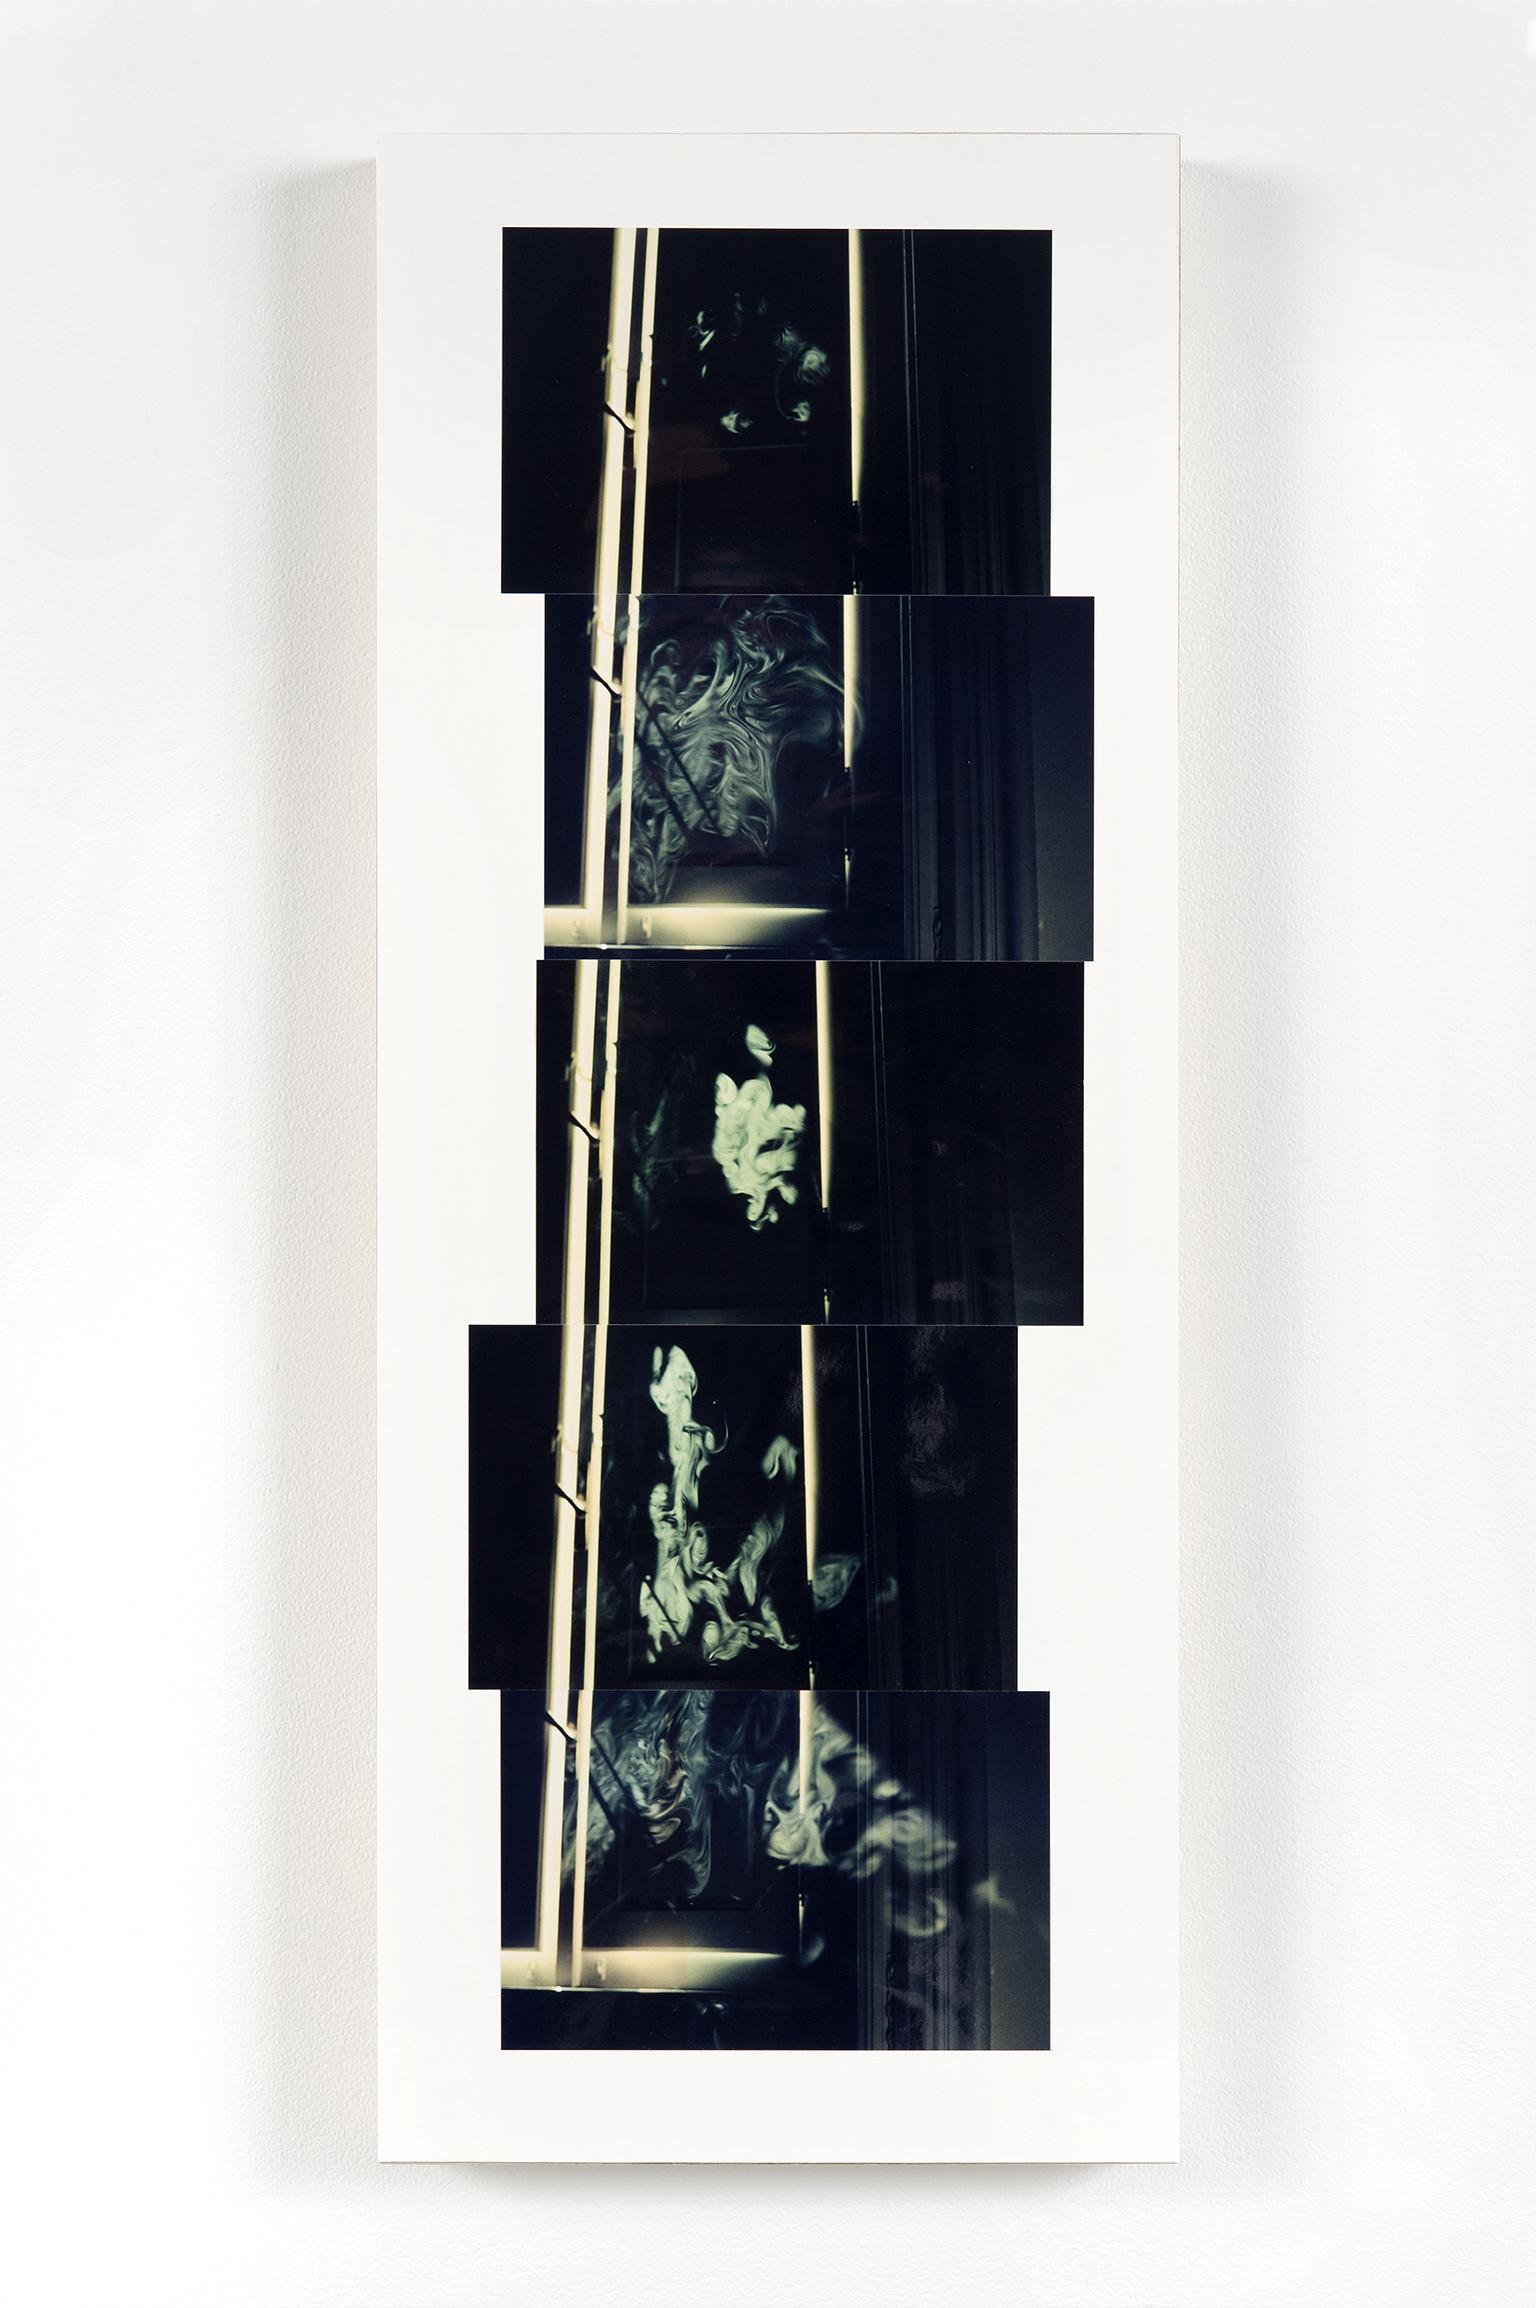 Robert Kleyn, Smoke, 1976–2011, colour photographs, 28 x 11 in. (70 x 27 cm) by